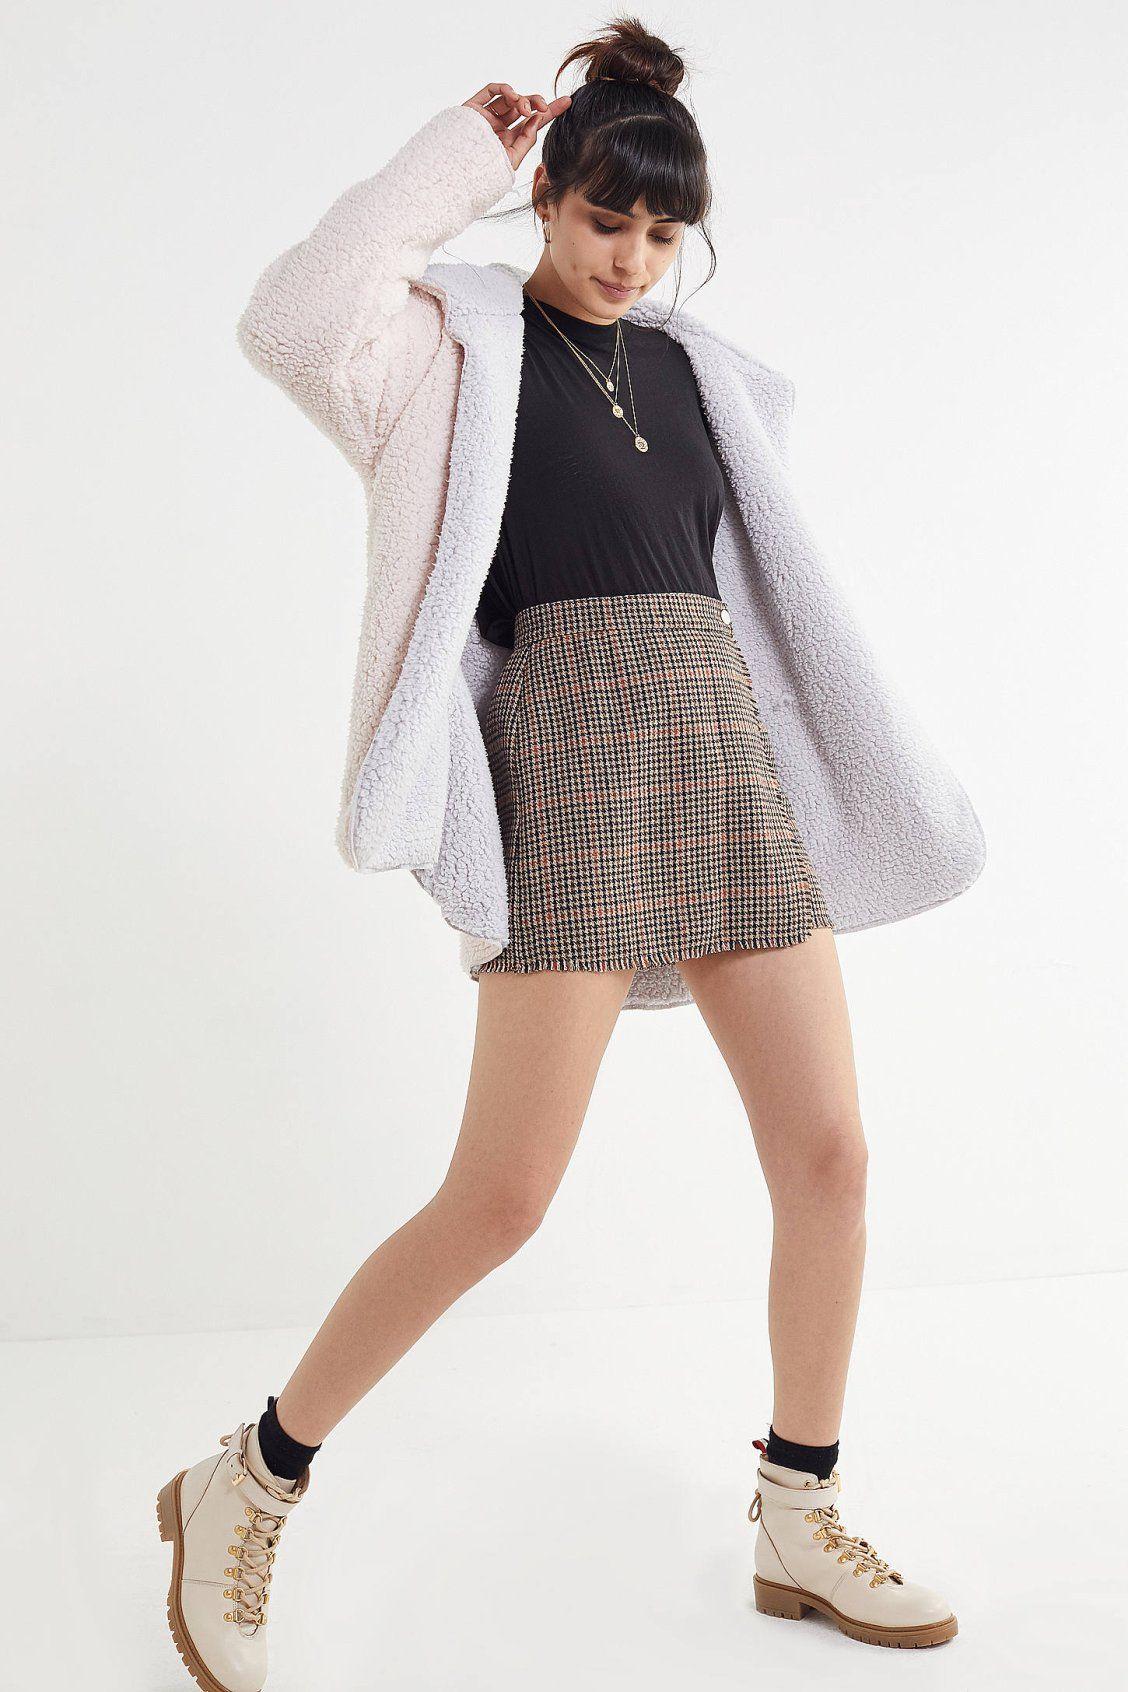 Uo Carmella Cozy Reversible Teddy Coat New Arrivals Pinterest